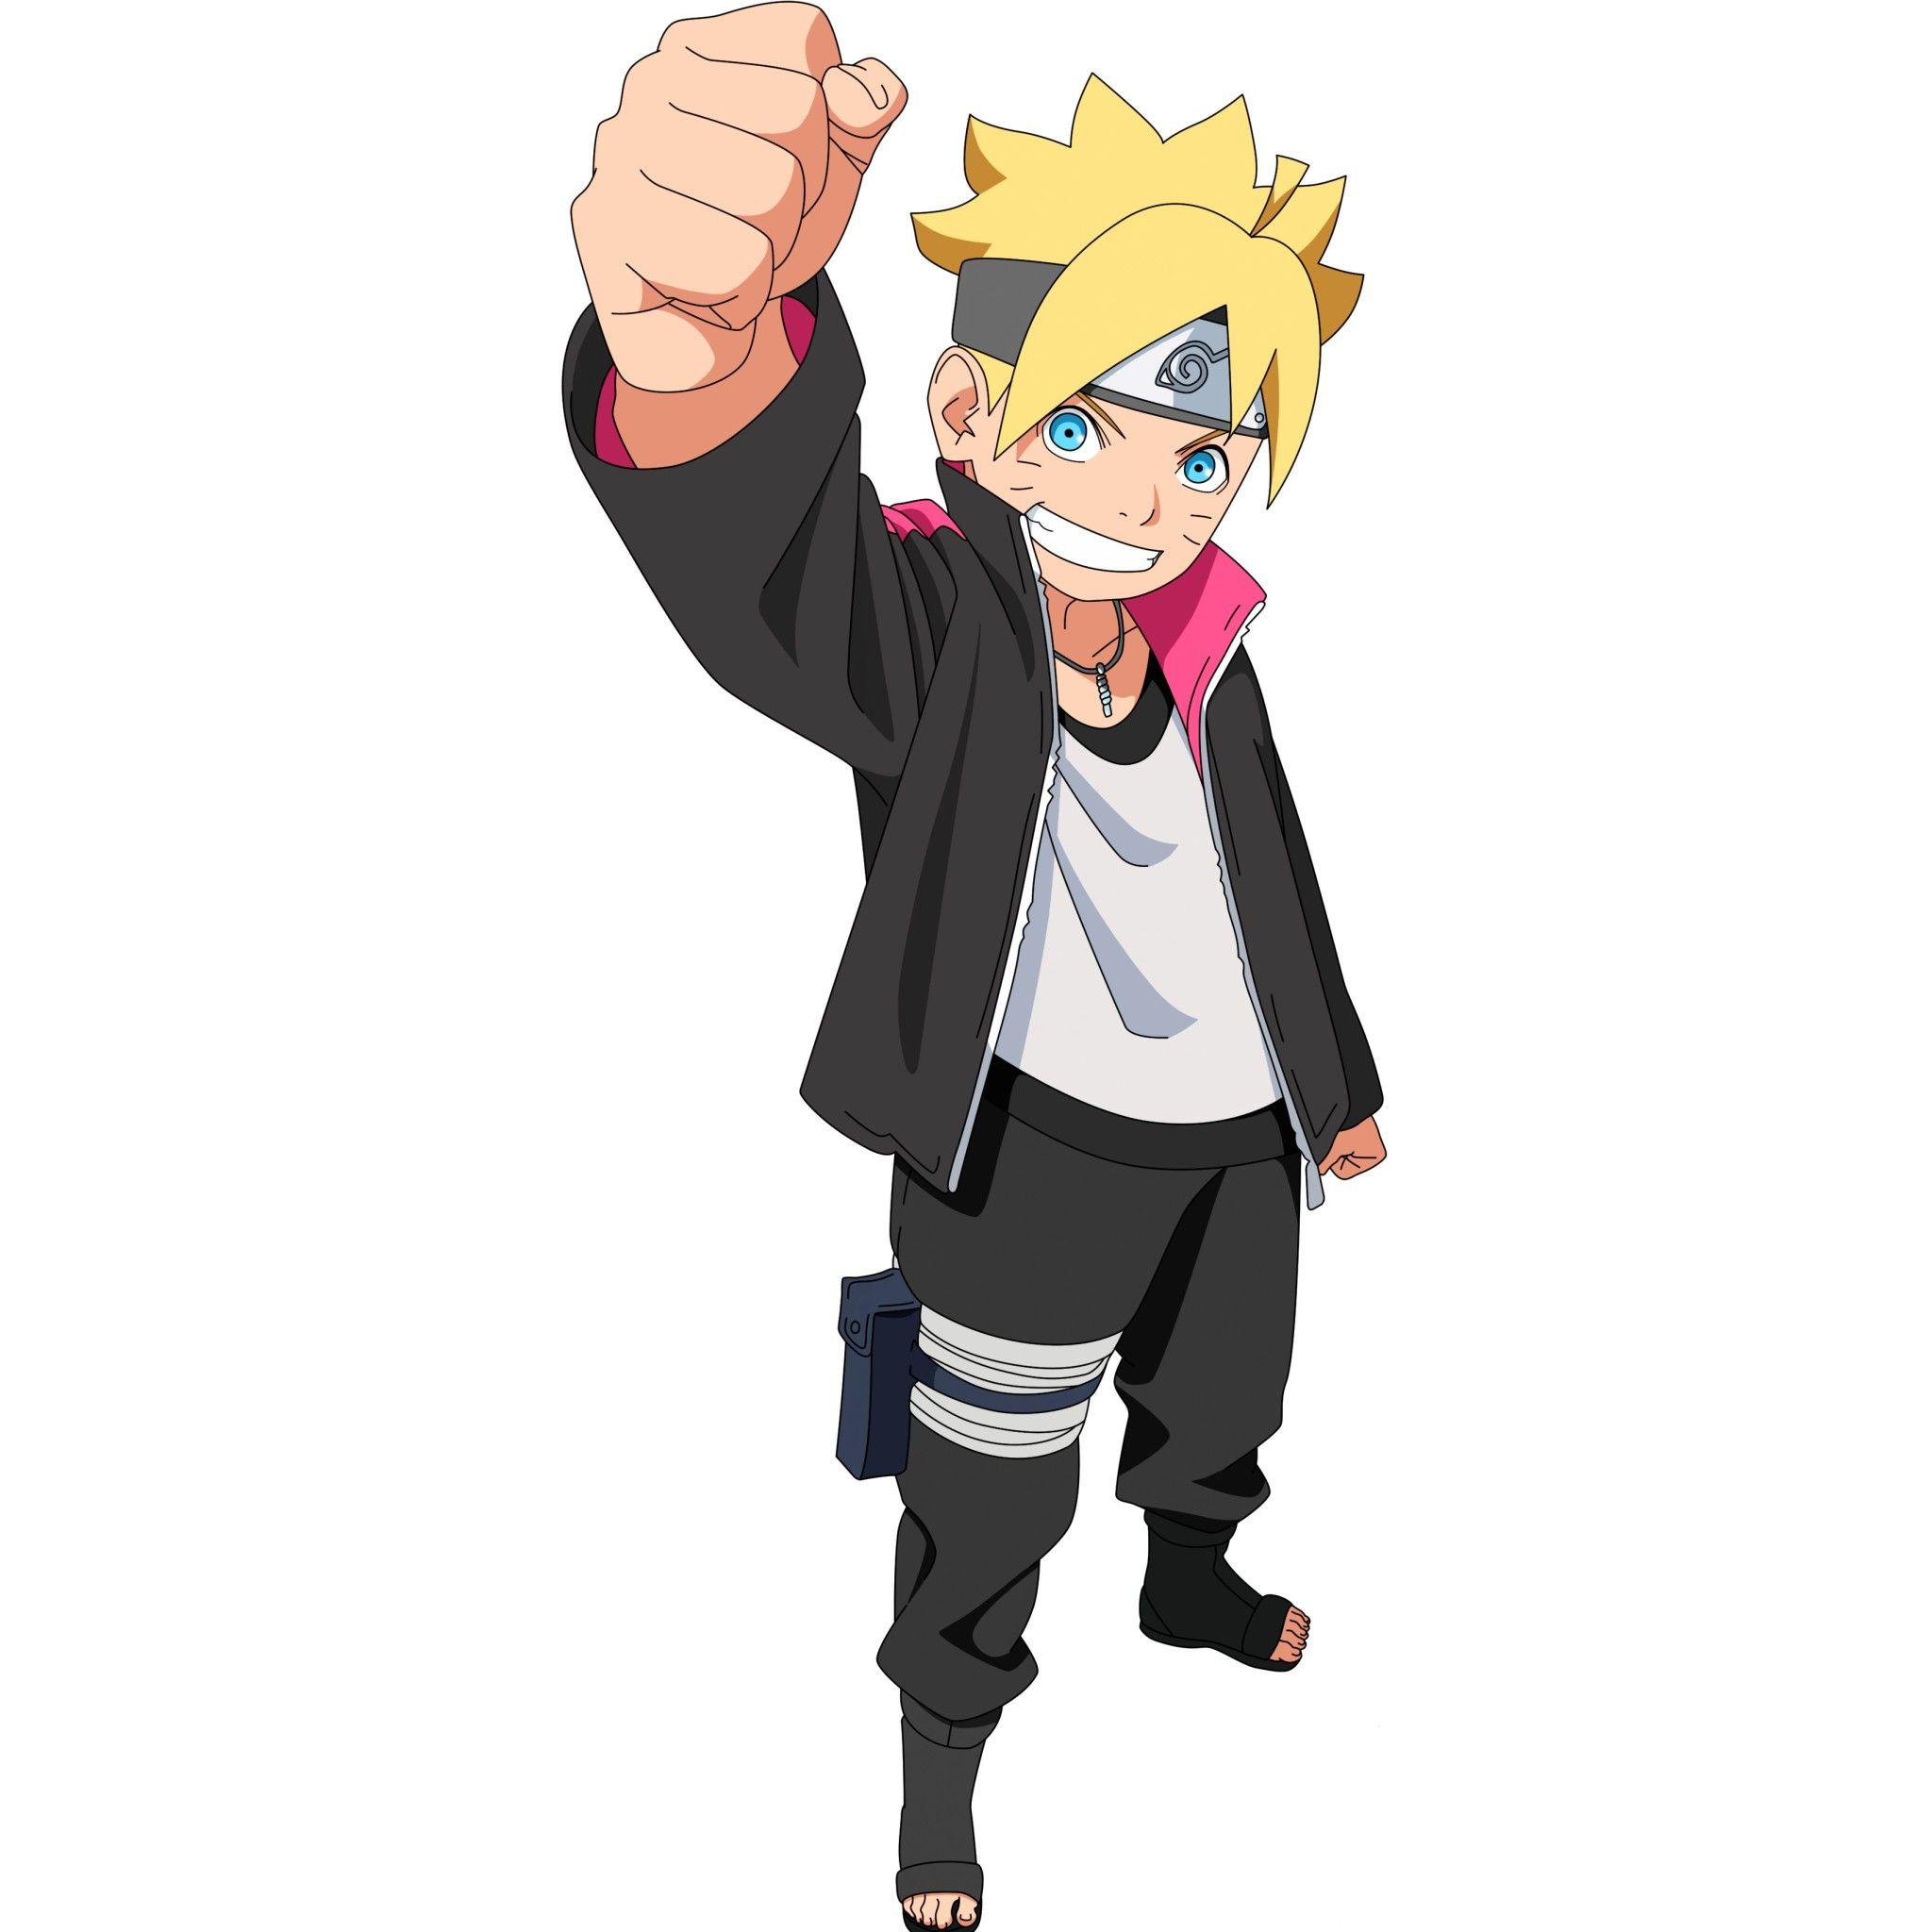 Boruto Naruto Tap To See More Of The Awesome Baruto Naruto Next Generations Wallpaper Boruto Naruto Next Generations Uzumaki Boruto Next Generation Wallpaper